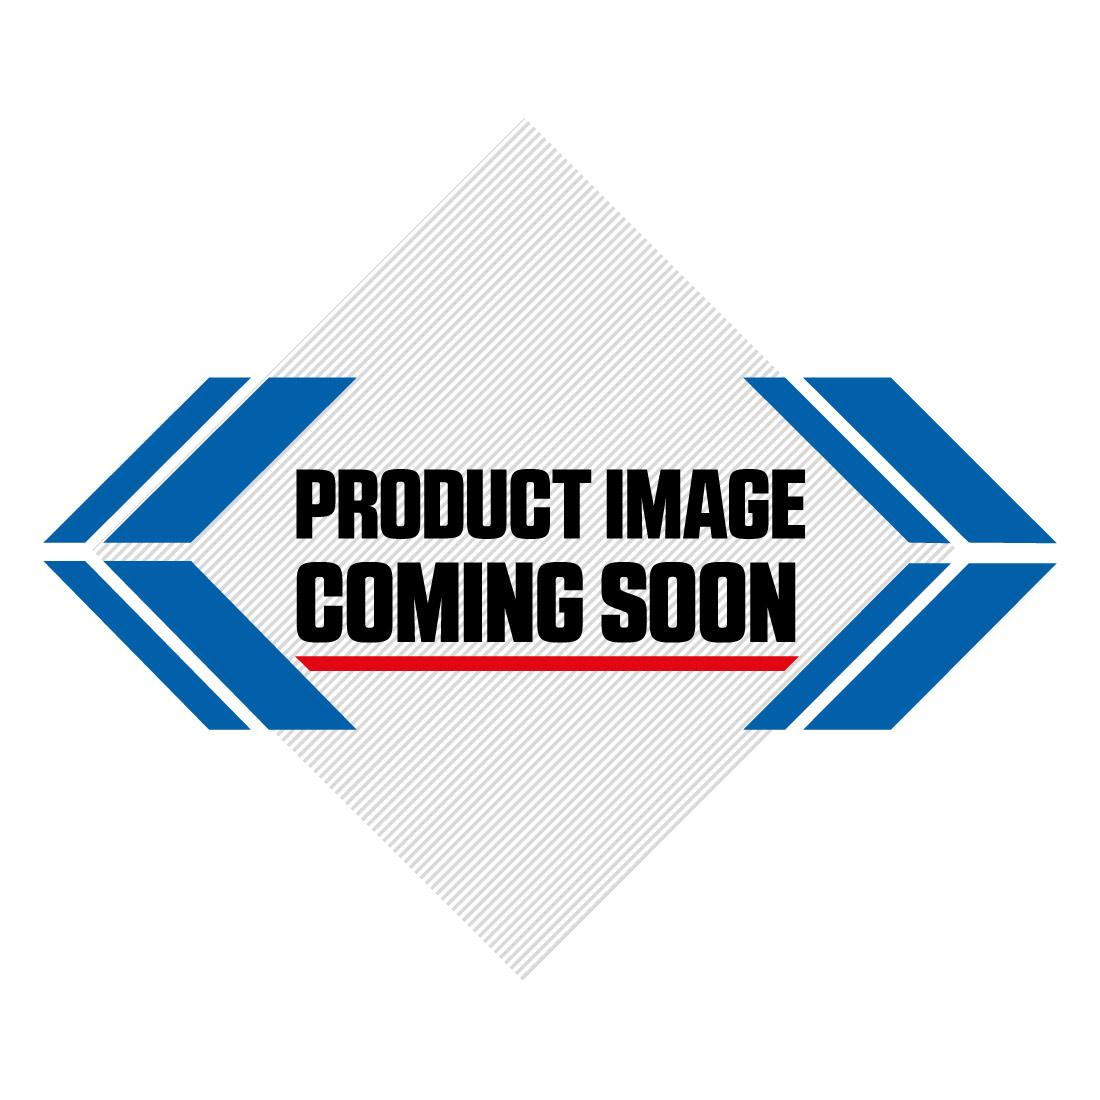 Honda Plastic Kit CRF 230 (08-14) OEM Factory Image-1>